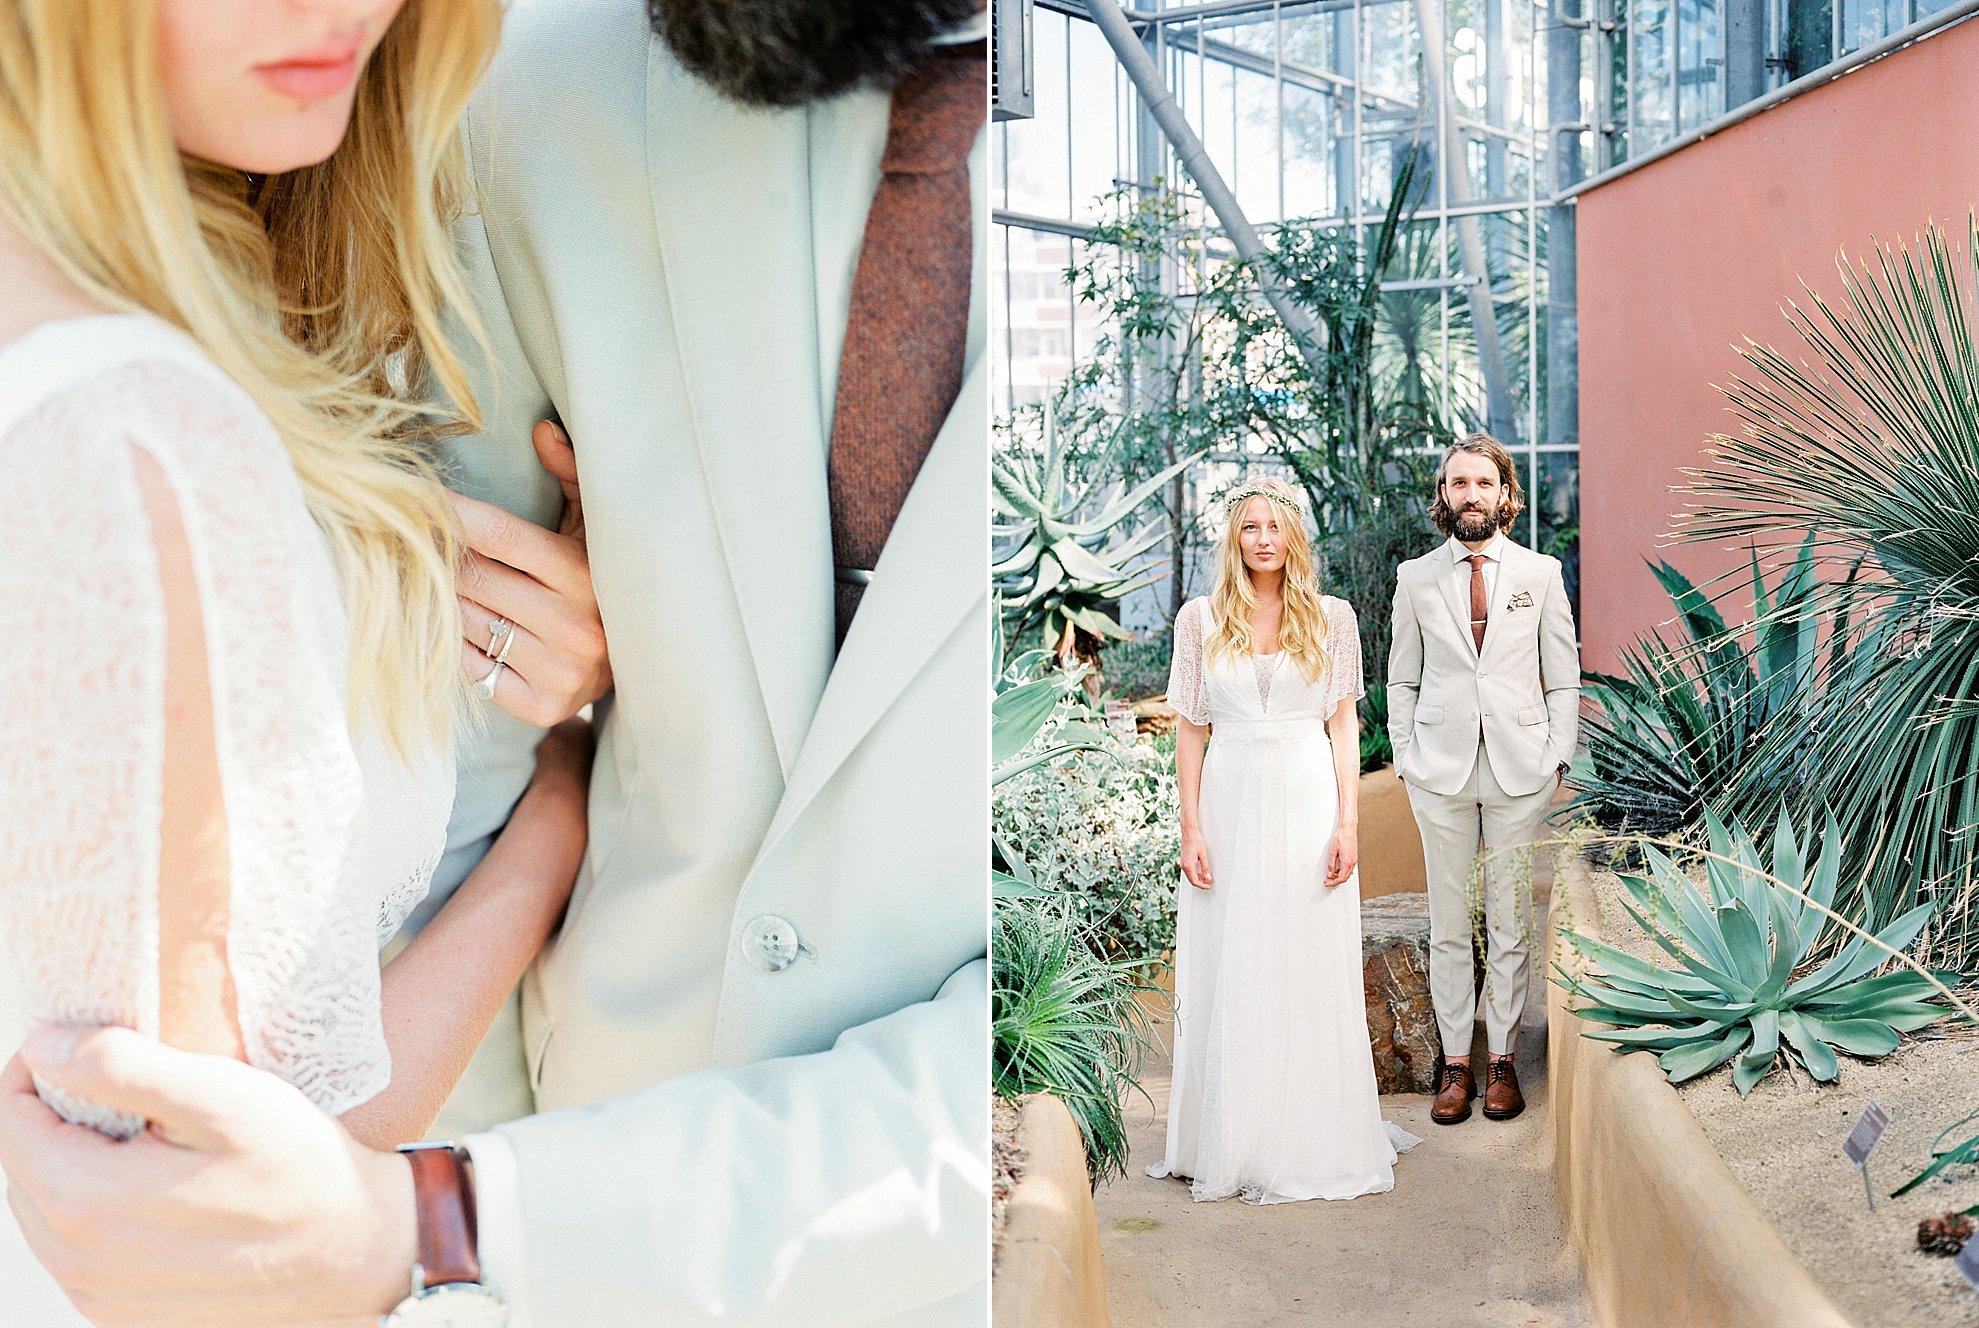 Amanda-Drost-photography-Hortus-Amsterdam-wedding_0008.jpg